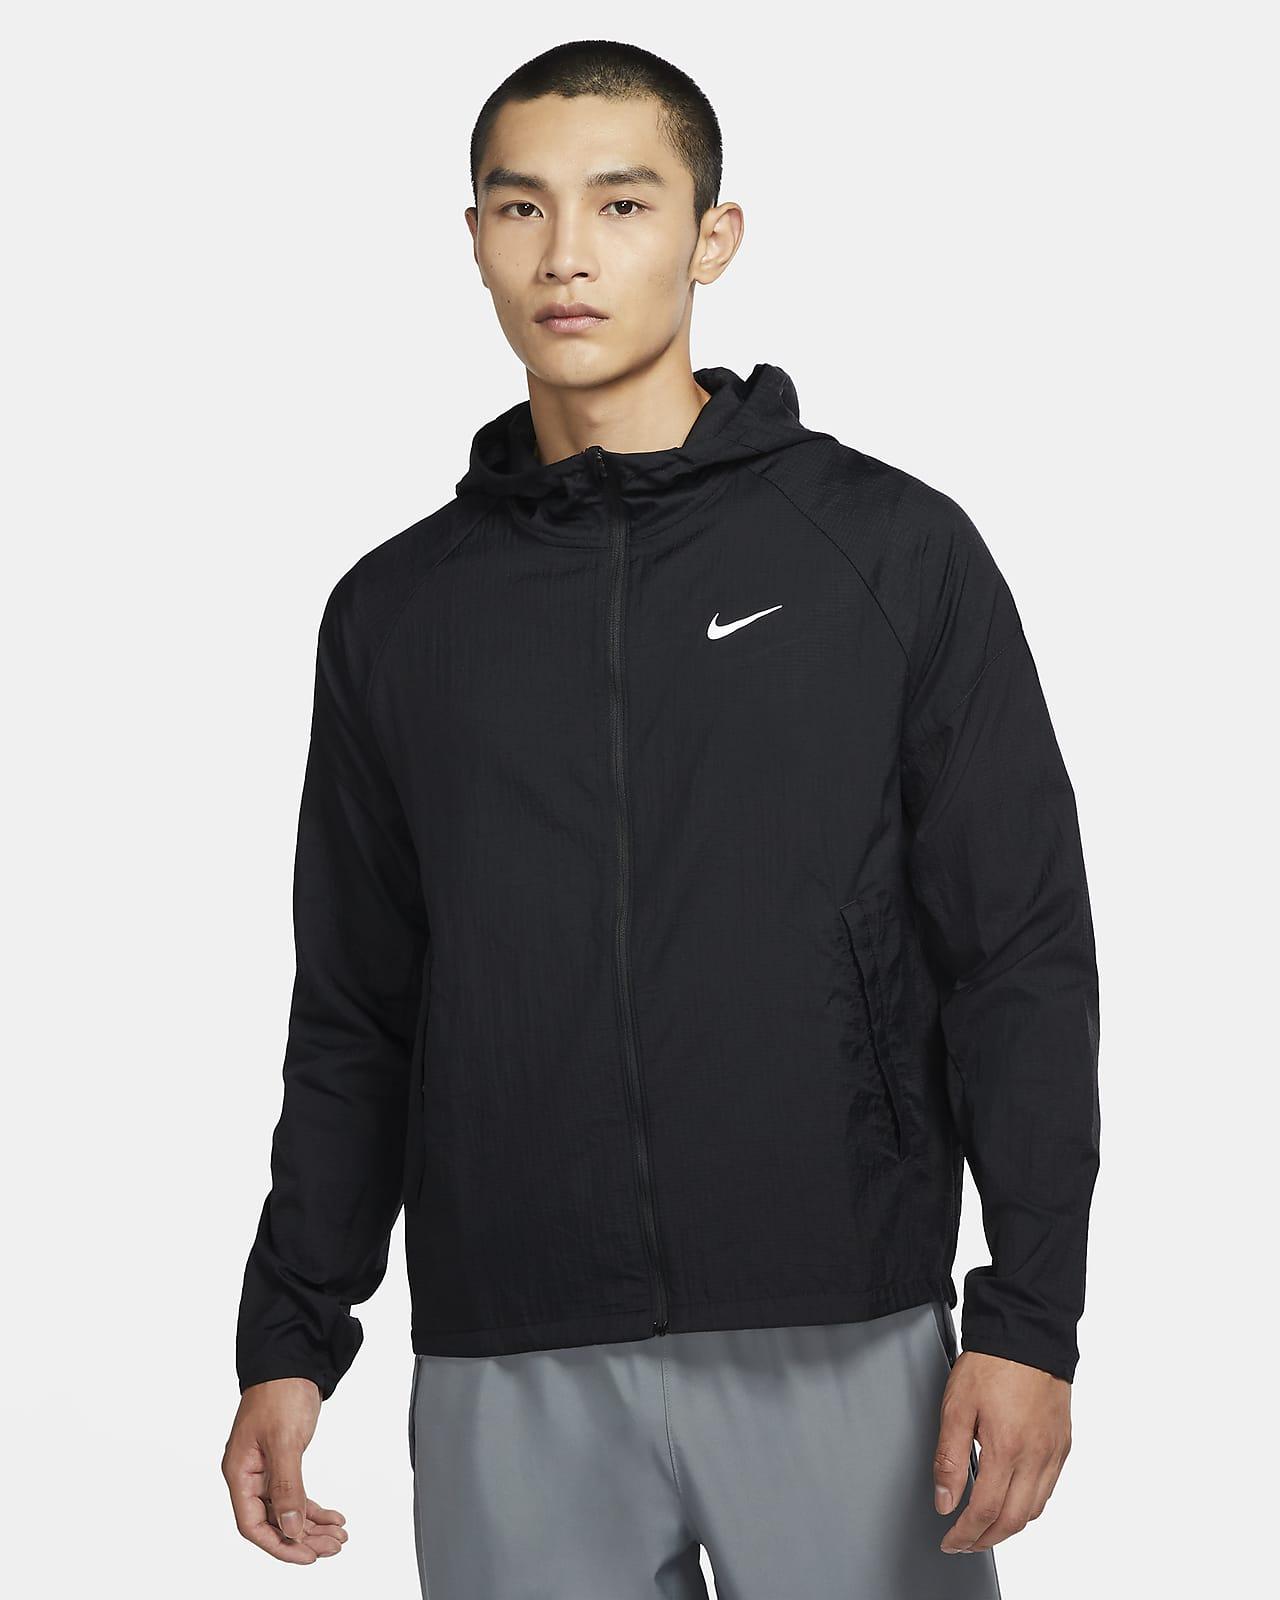 Nike Essential Herren-Laufjacke